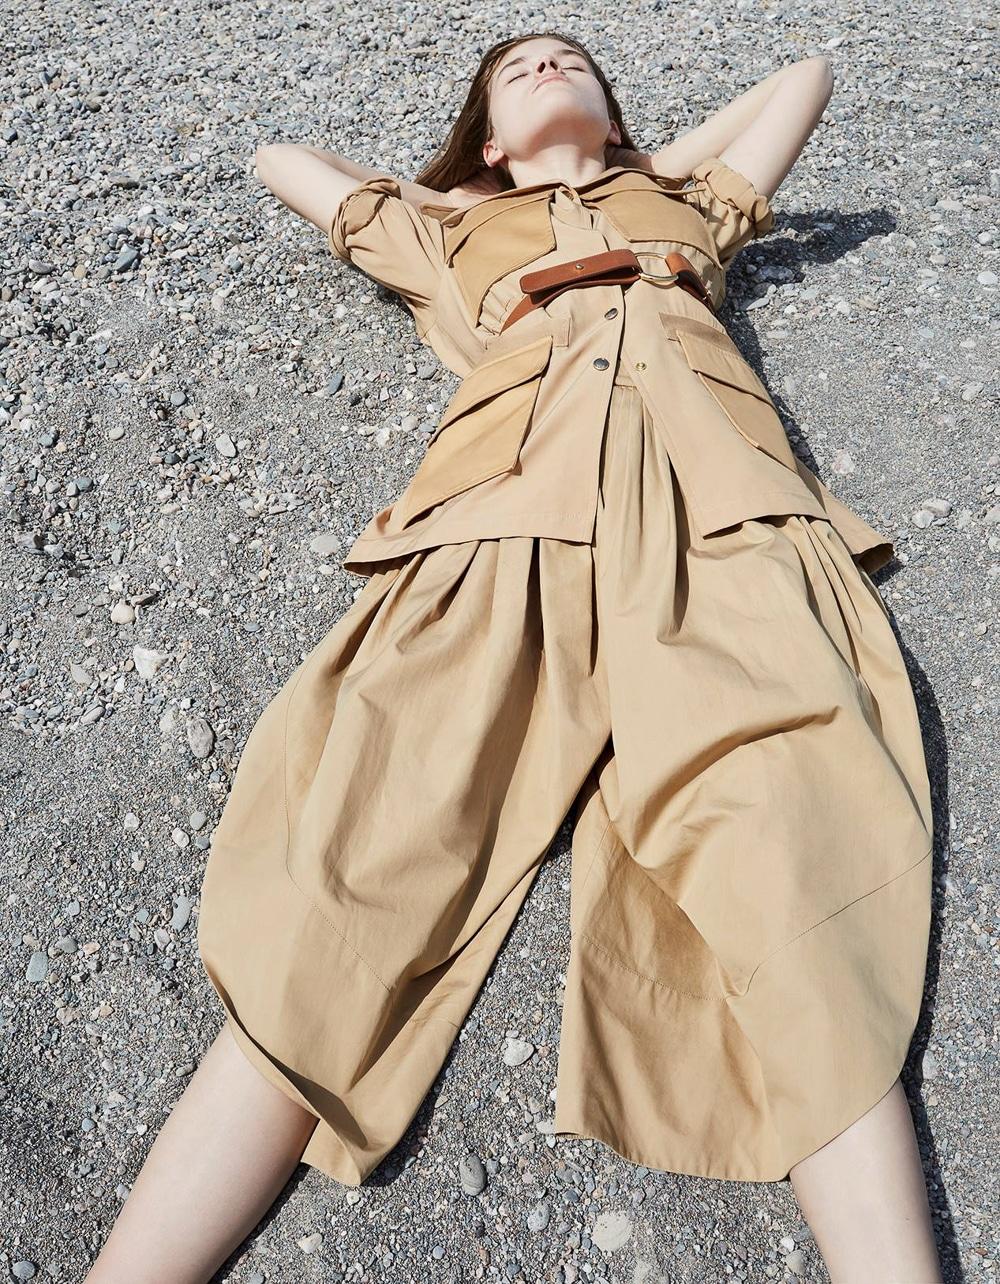 Vogue-Poland-Molly-Smith-Agata-Pospieszynska-2.jpg